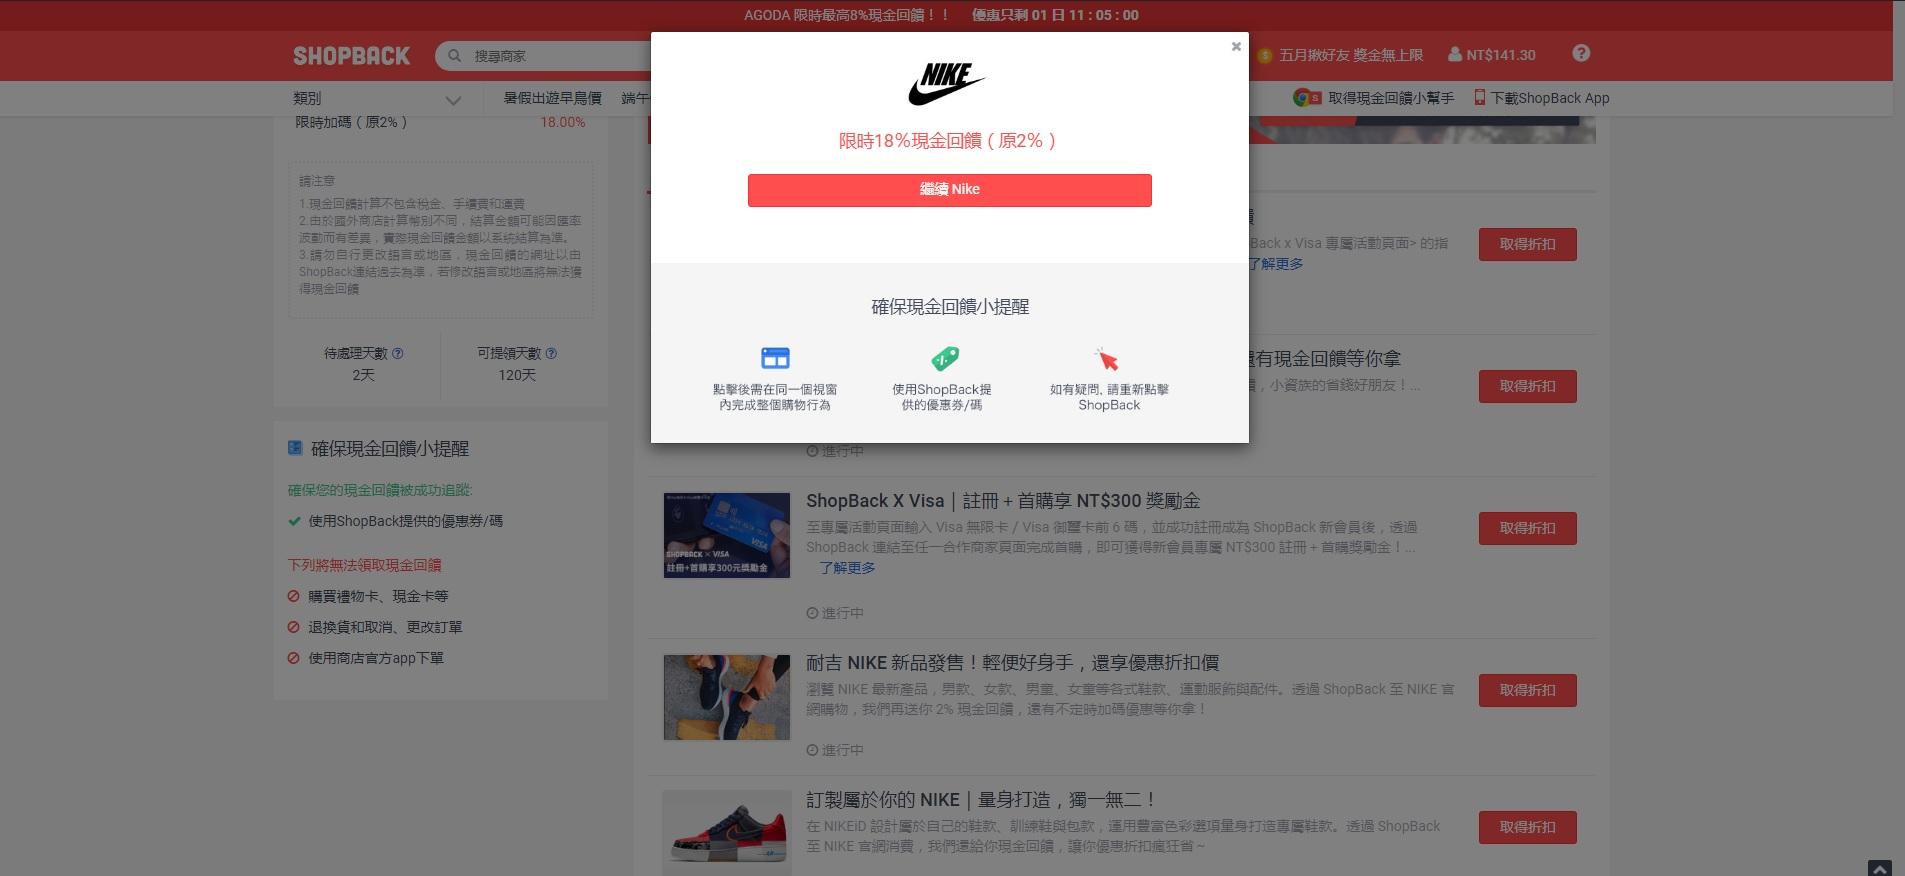 透過Shopback進入Nike